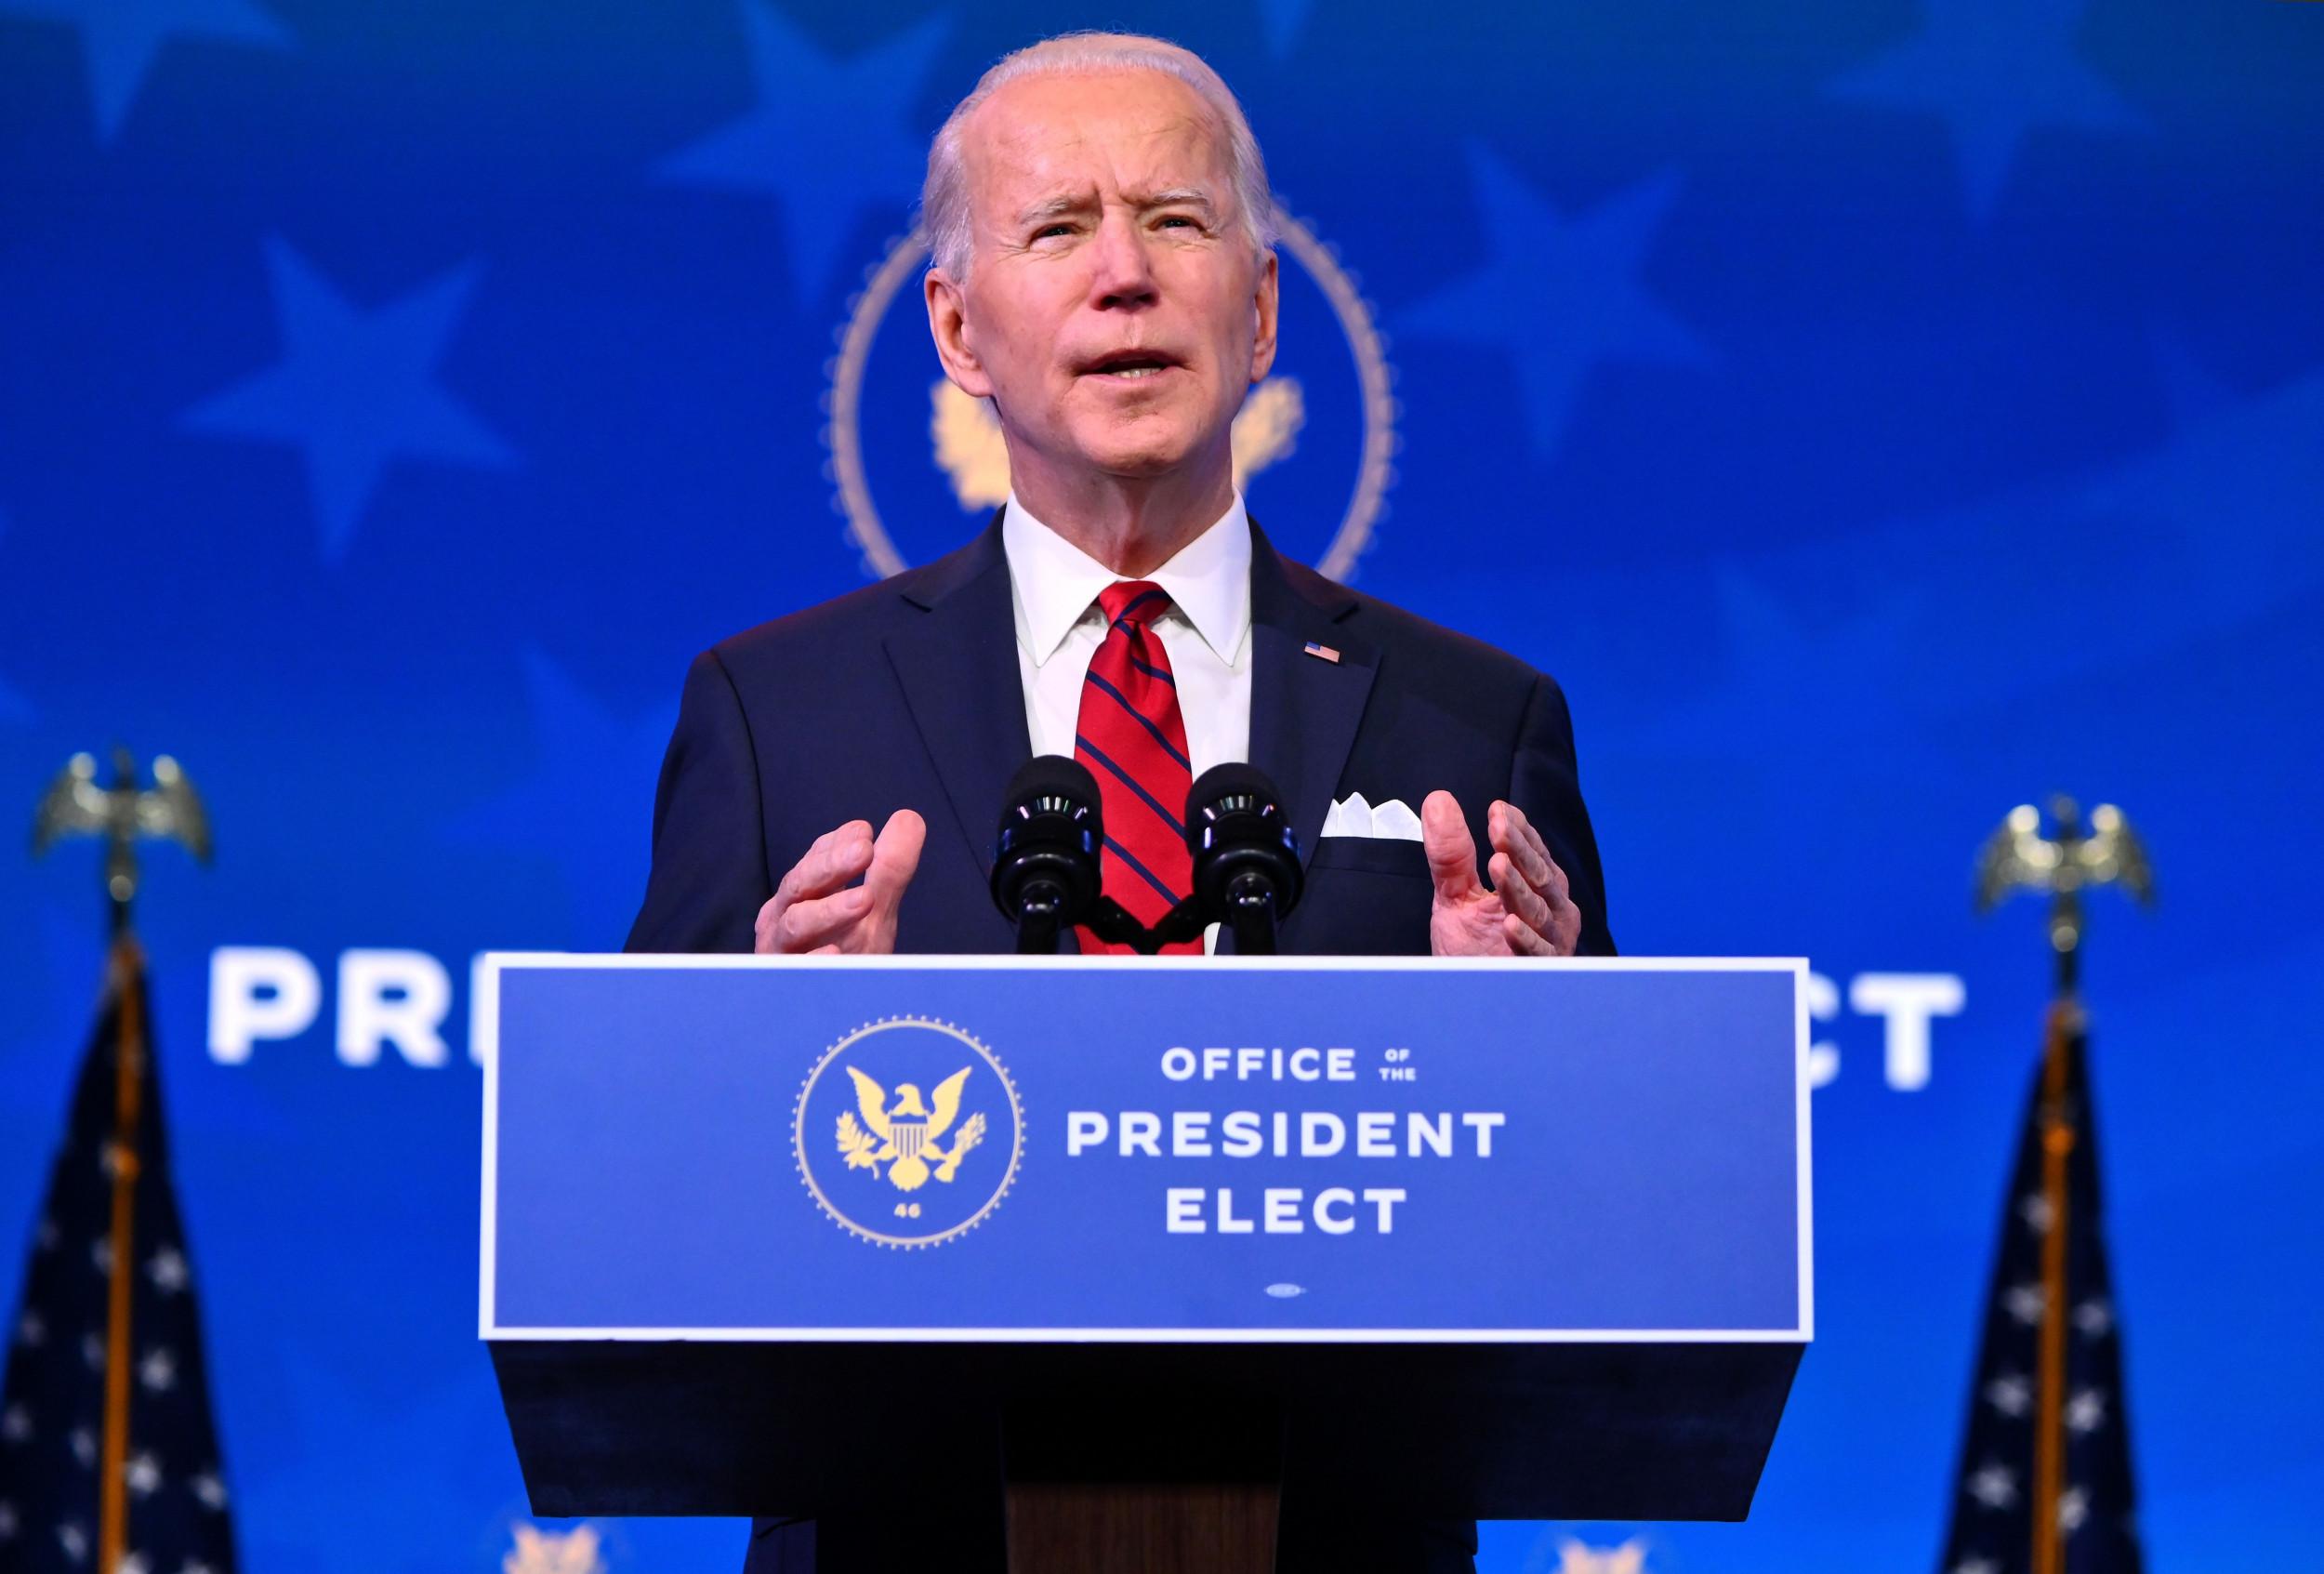 Joe Biden Inauguration: Where Does it Take Place, What ...